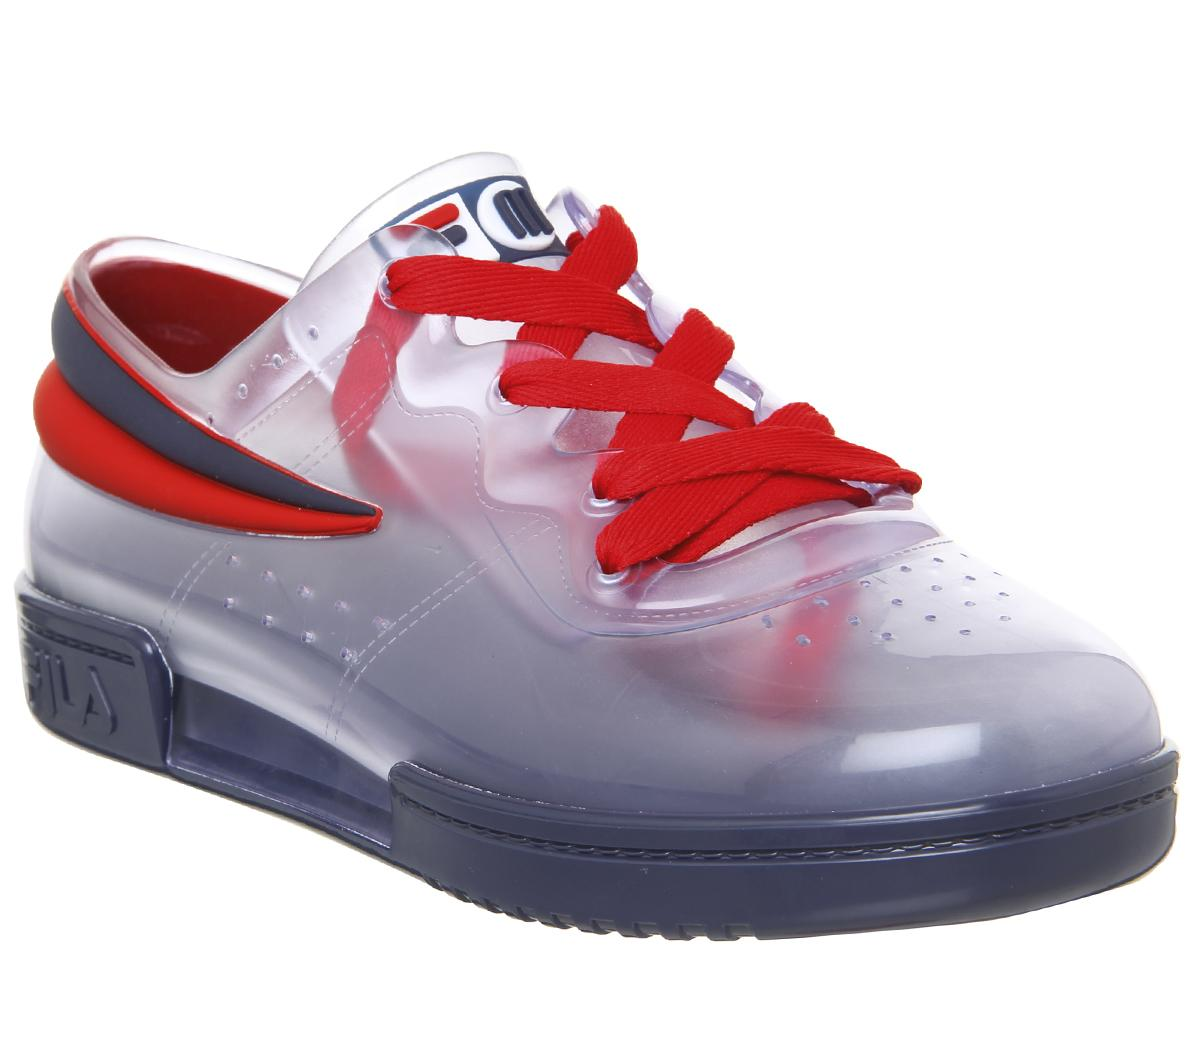 Melissa x Fila Sneakers